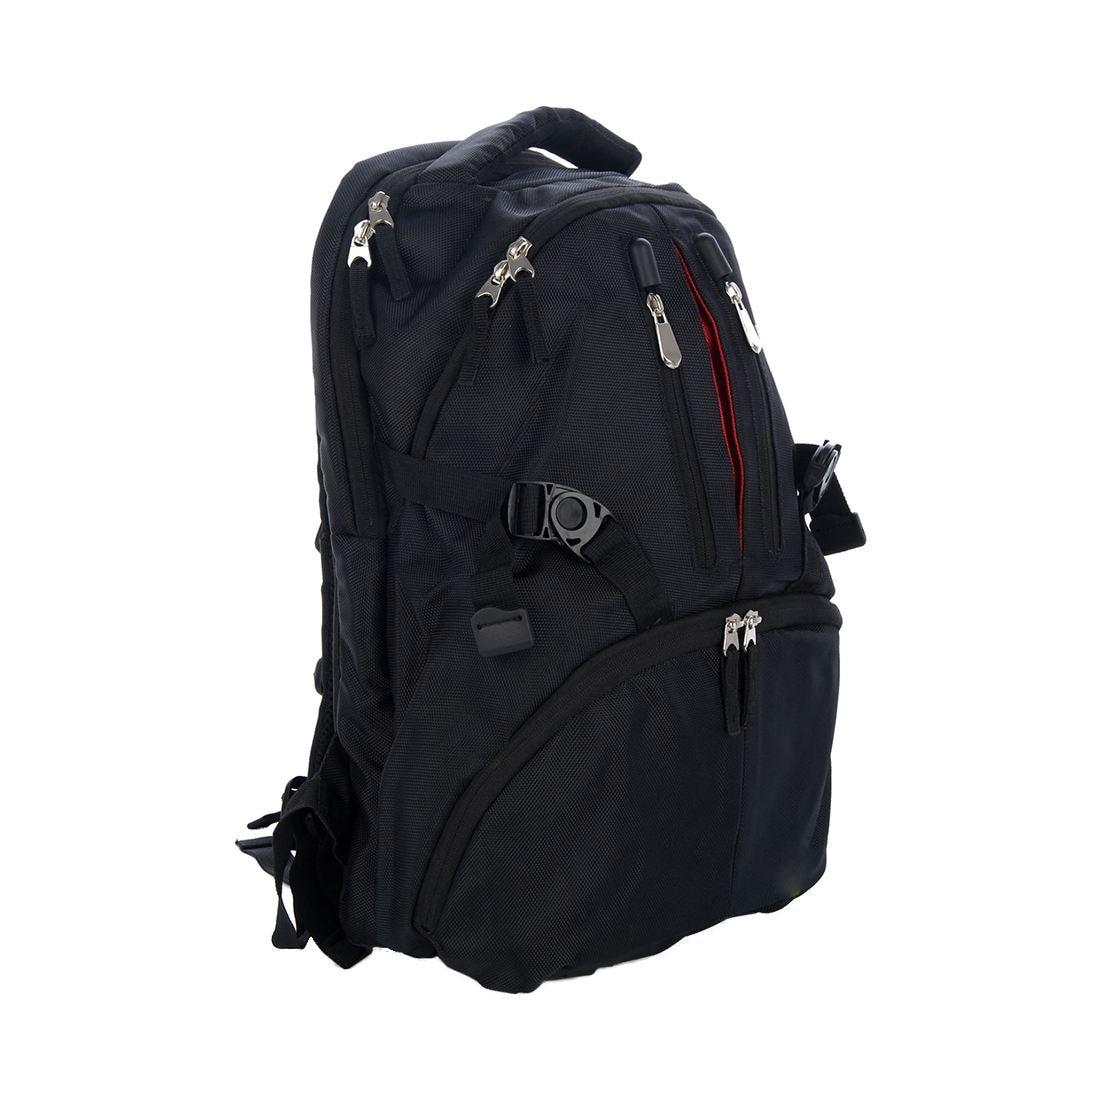 цена на SCLS Camera Bag DSLR SLR Laptop Backpack Rucksack Case Bag For Nikon Sony Canon Olympus Panasonic,Samsung